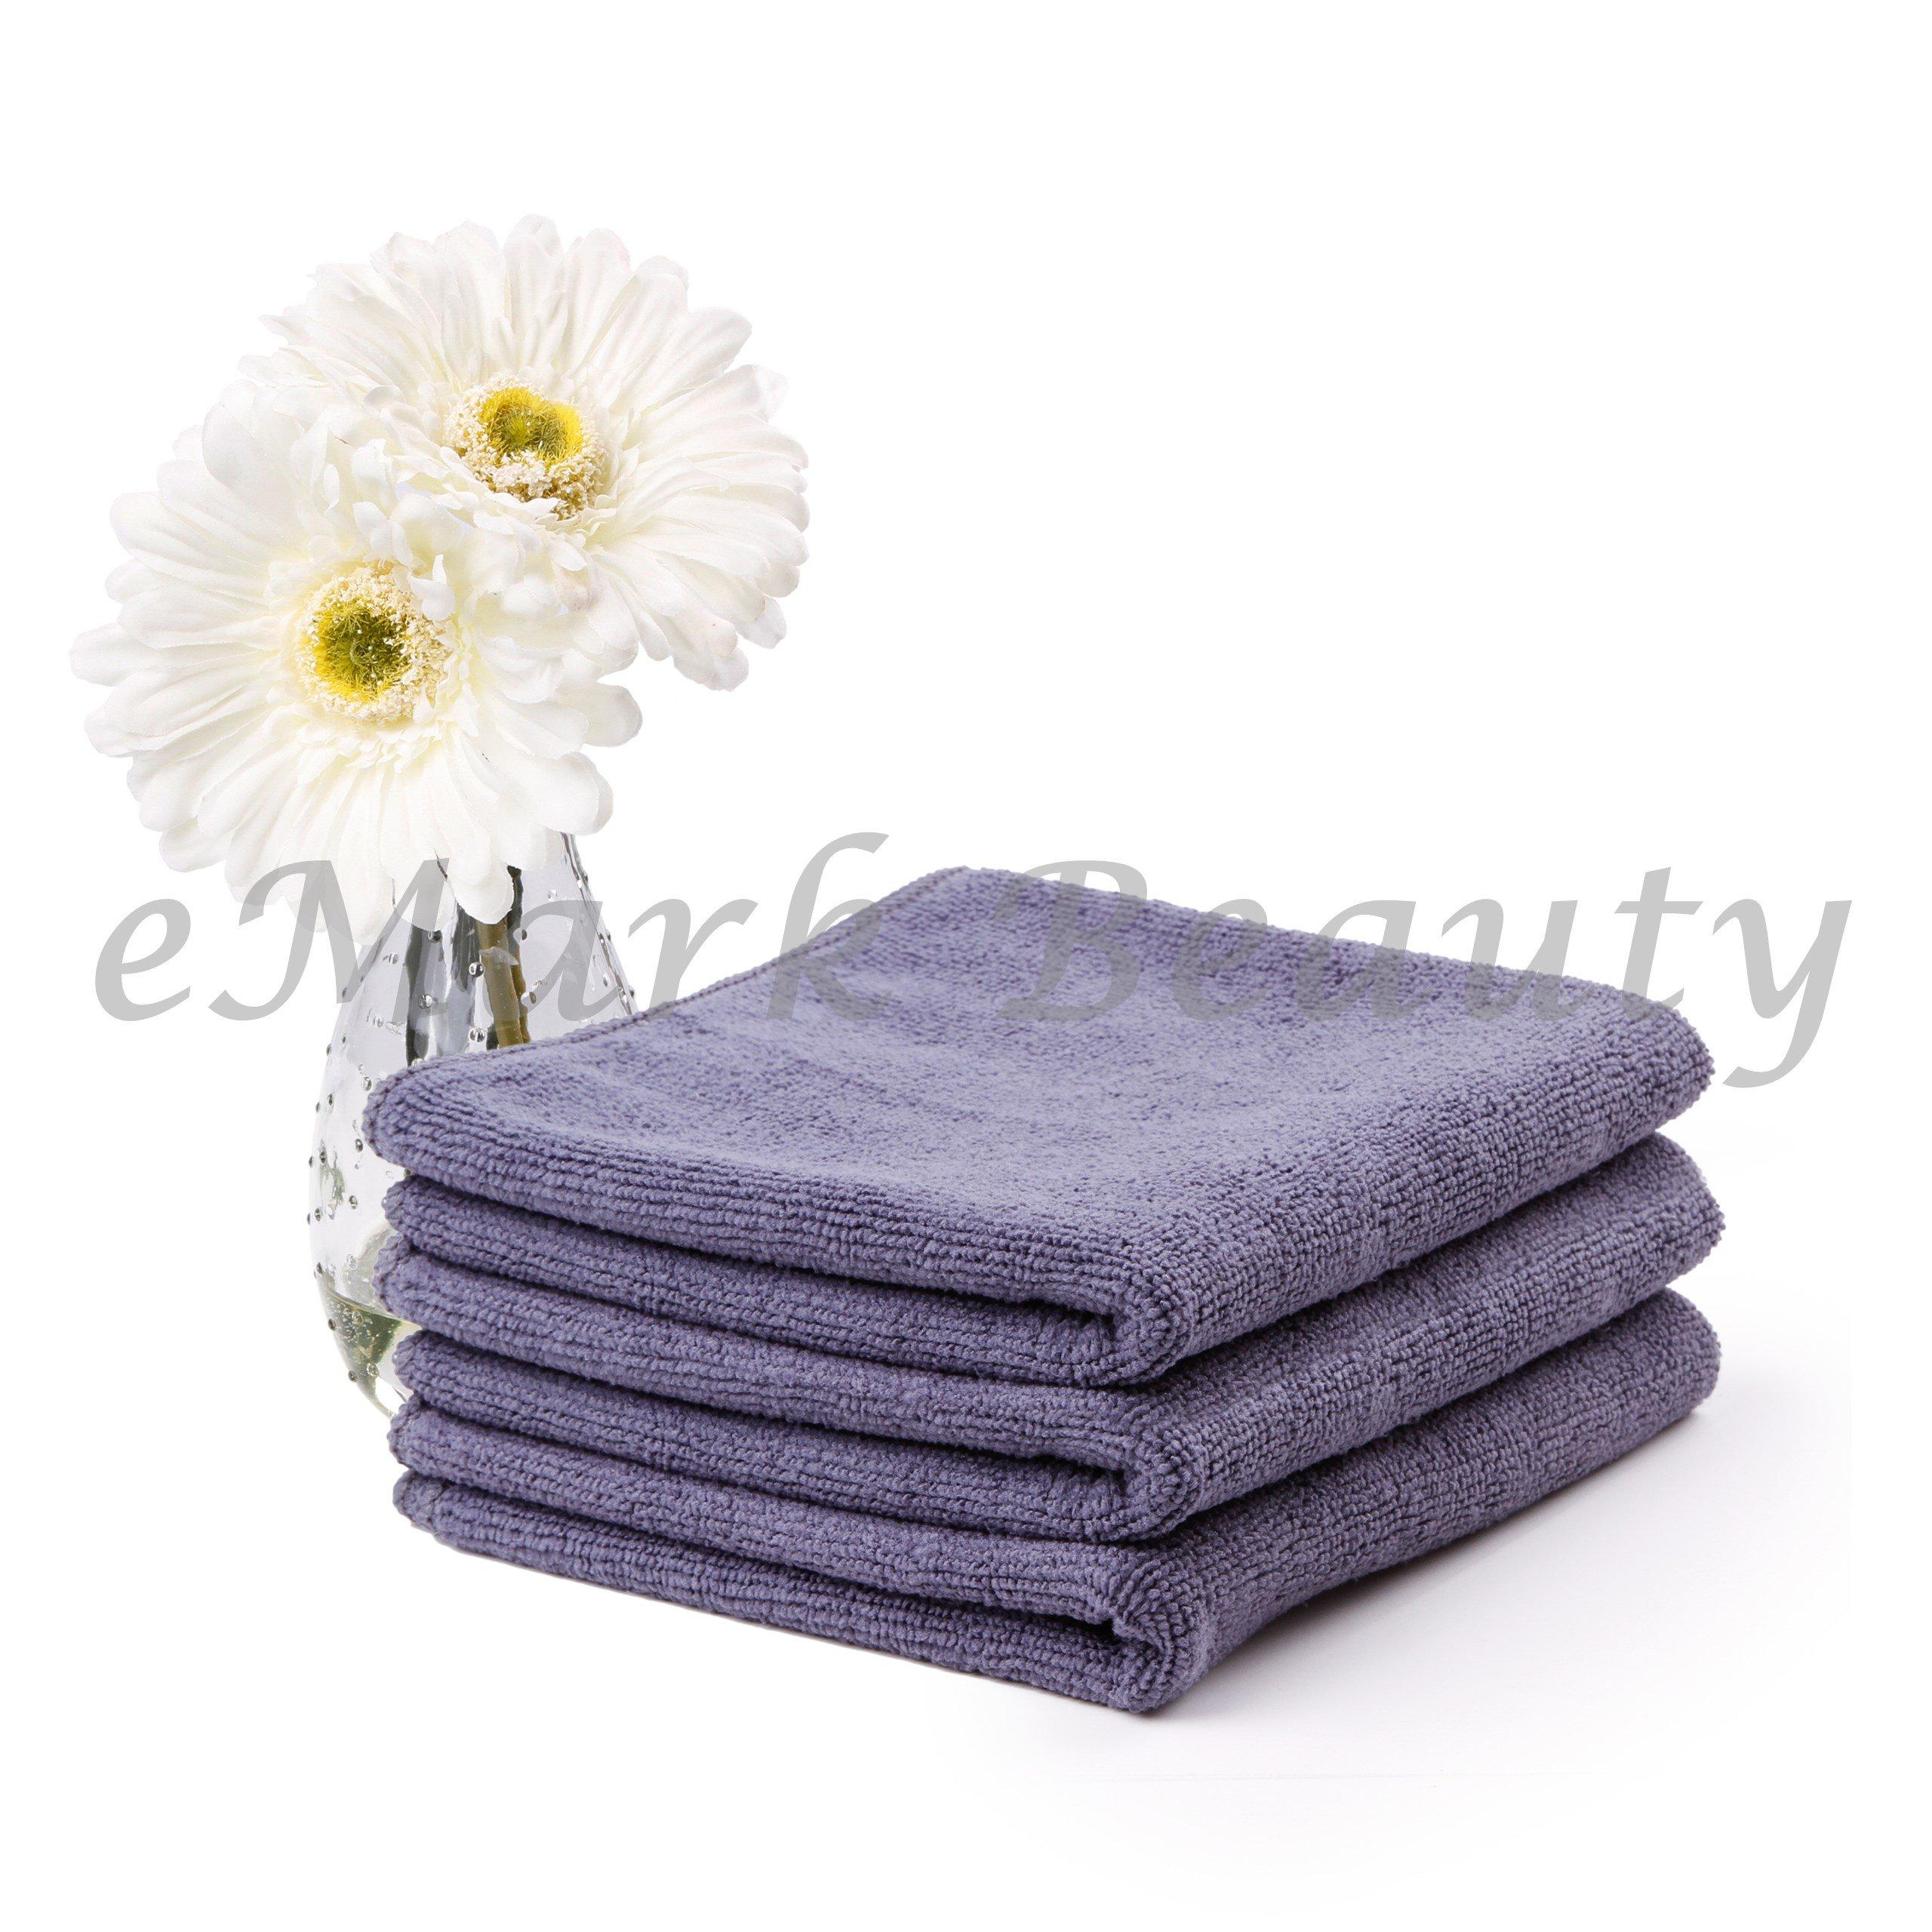 Shampoo Tilt Bowl Sink Towel Storage Cabinet Recline Chair Shampoo Cabinet TLC-B13WT-BC16-216A-EMTC